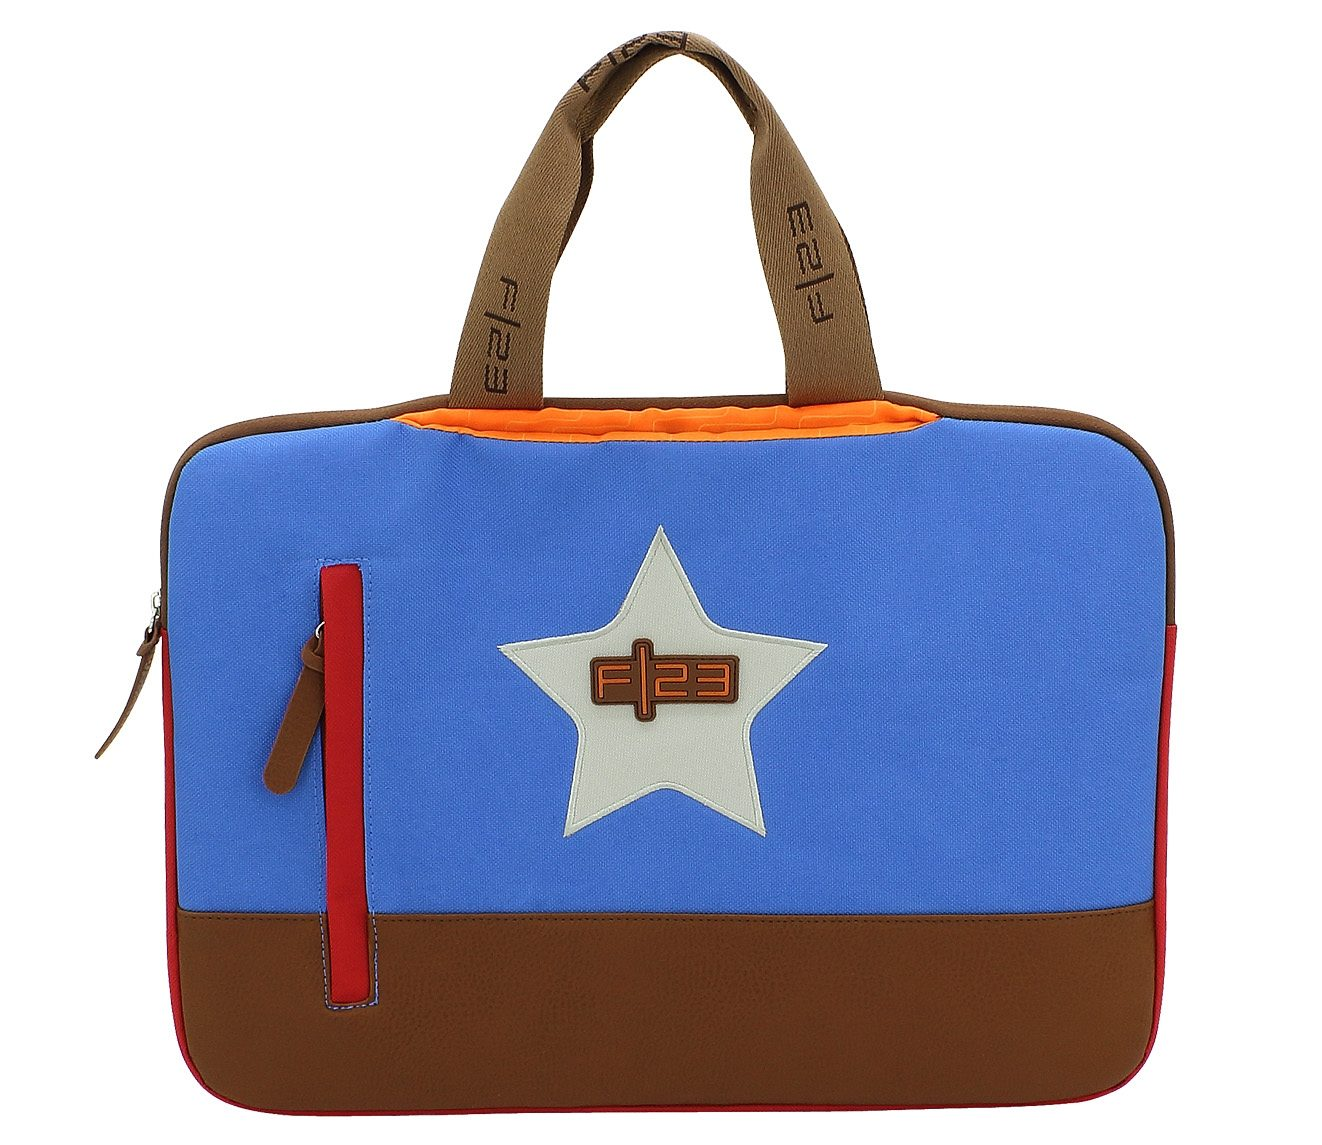 F23 Laptop-Tasche 15-Zoll, »Star«